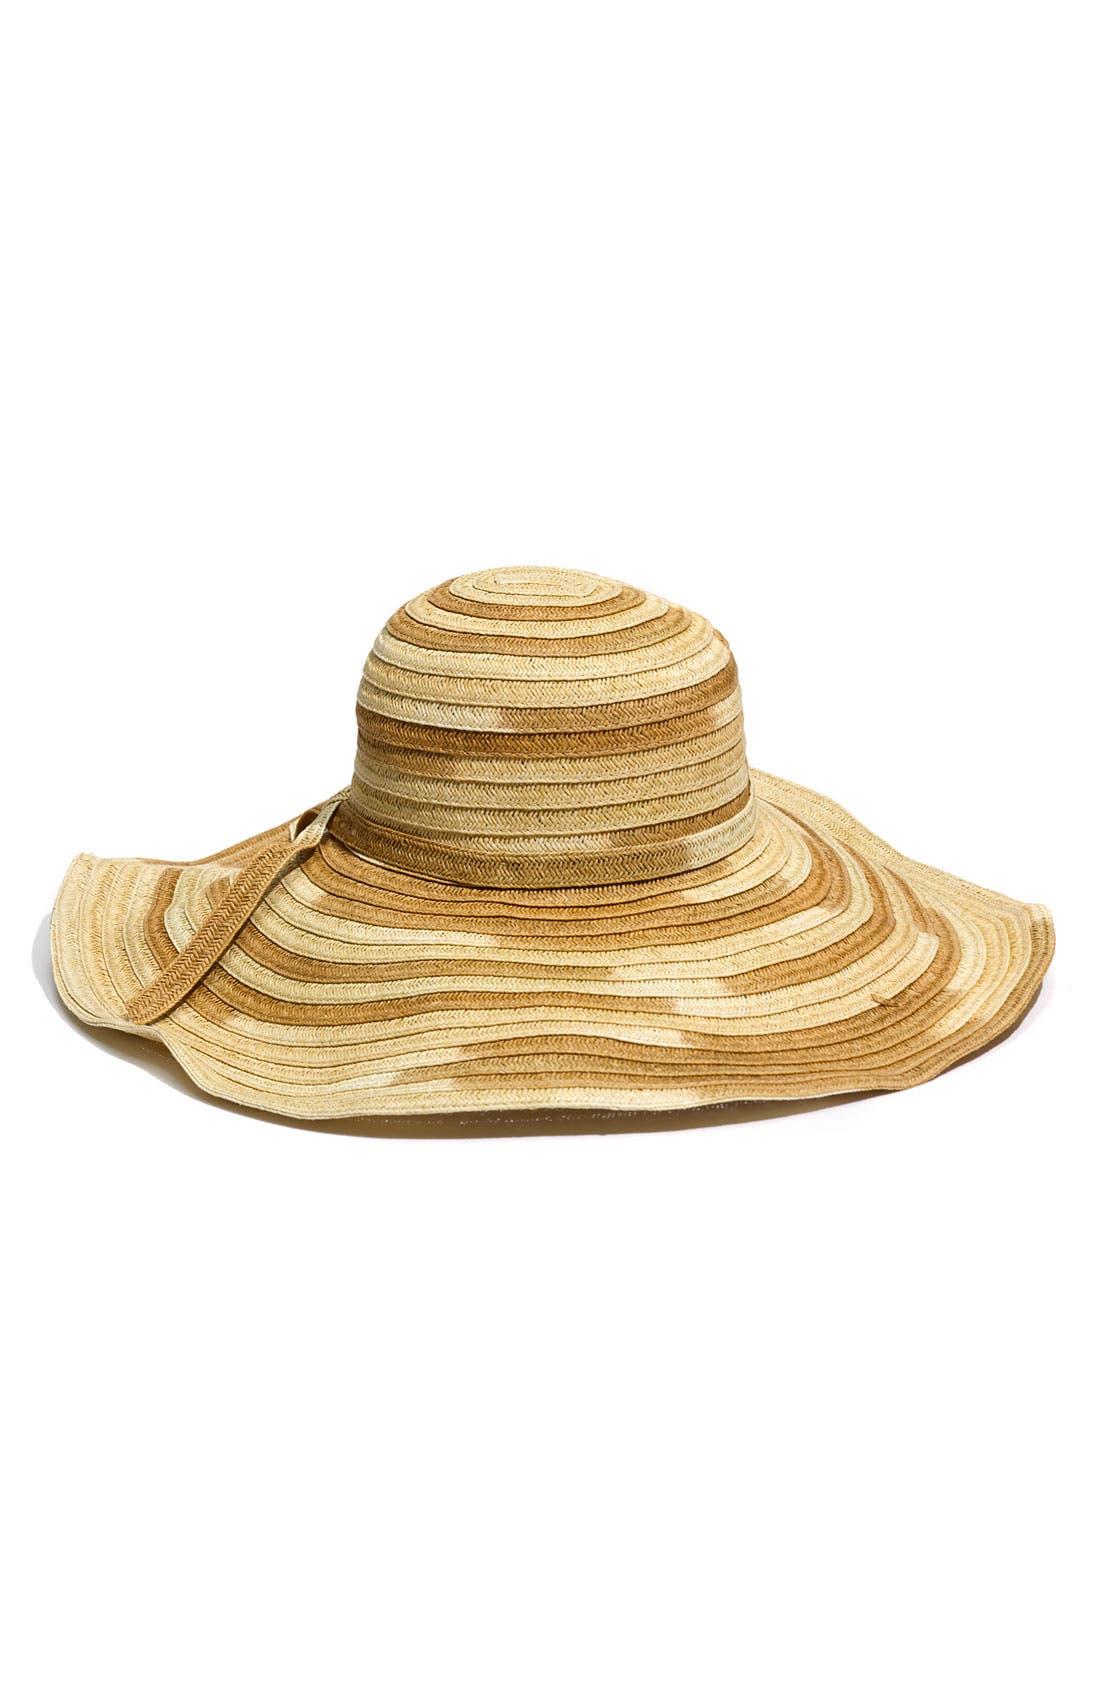 Main Image - Jessica Simpson 'Oversized' Ombré Hat